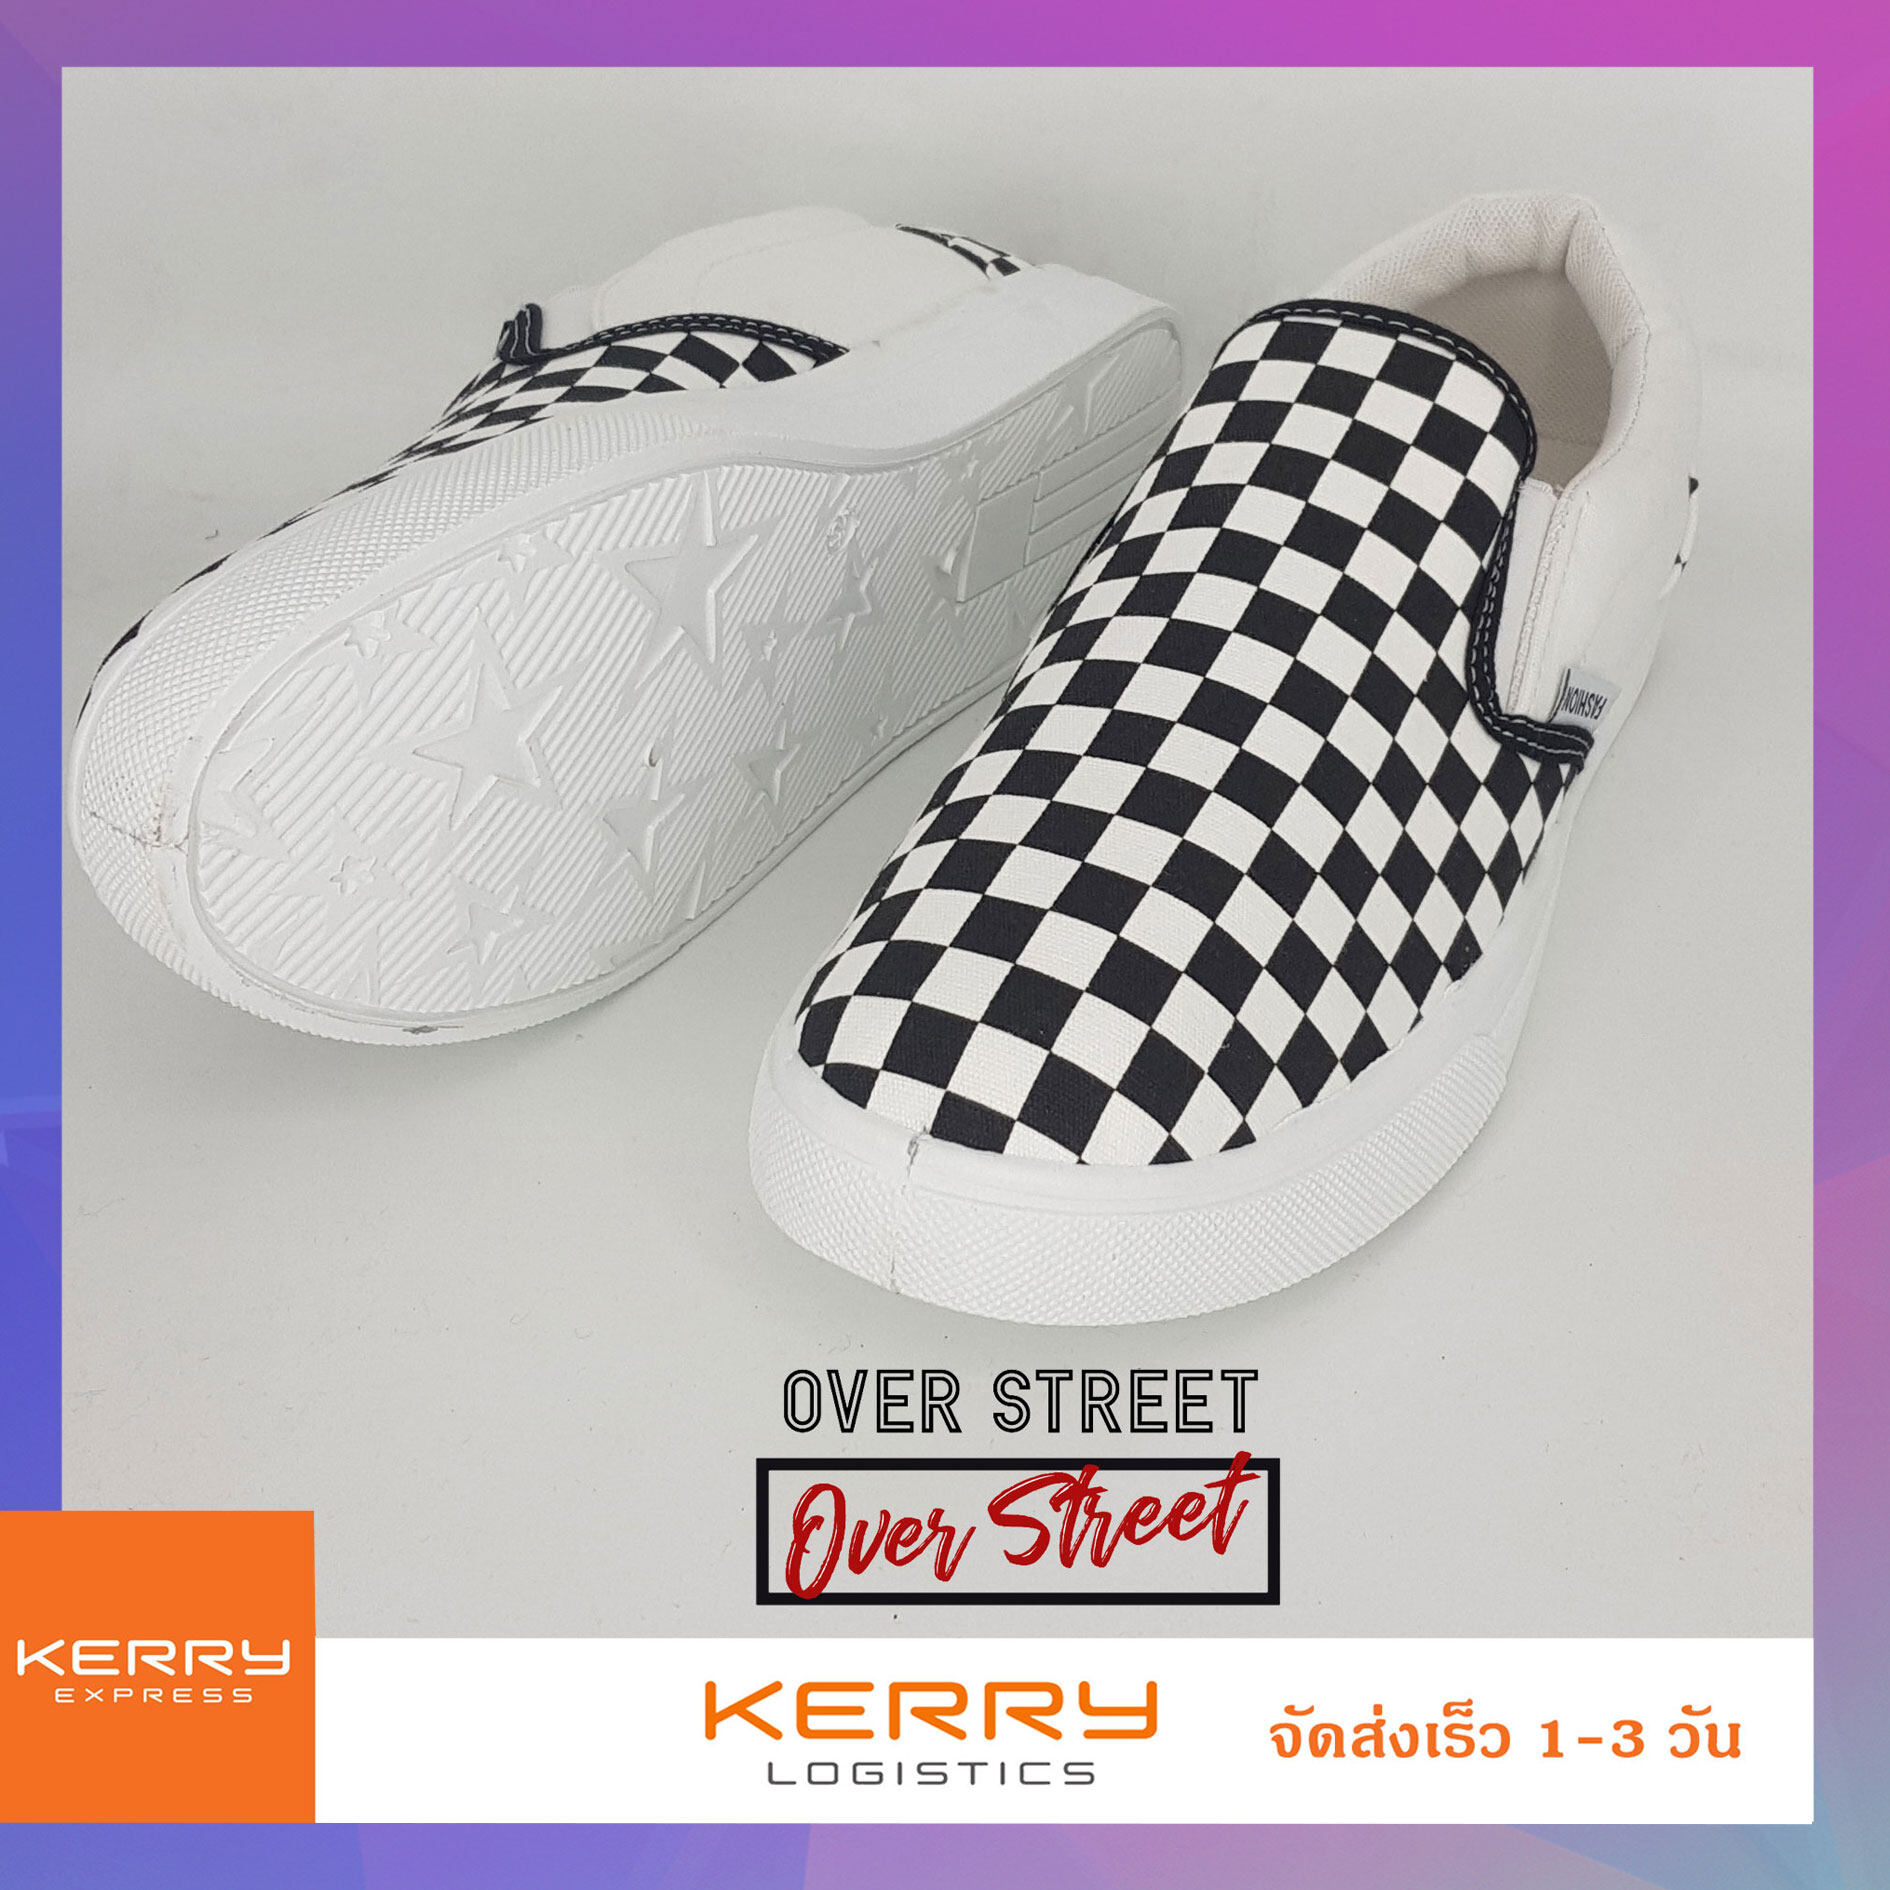 Overstreet รองเท้าผ้าใบผู้ชาย ลายตารางหมากรุก (checker) Slip On (สลิปออน) ไร้เชือก รุ่นฮิตตลอดกาล ออกเที่ยวเท่ๆ แนวstreet !!!!.